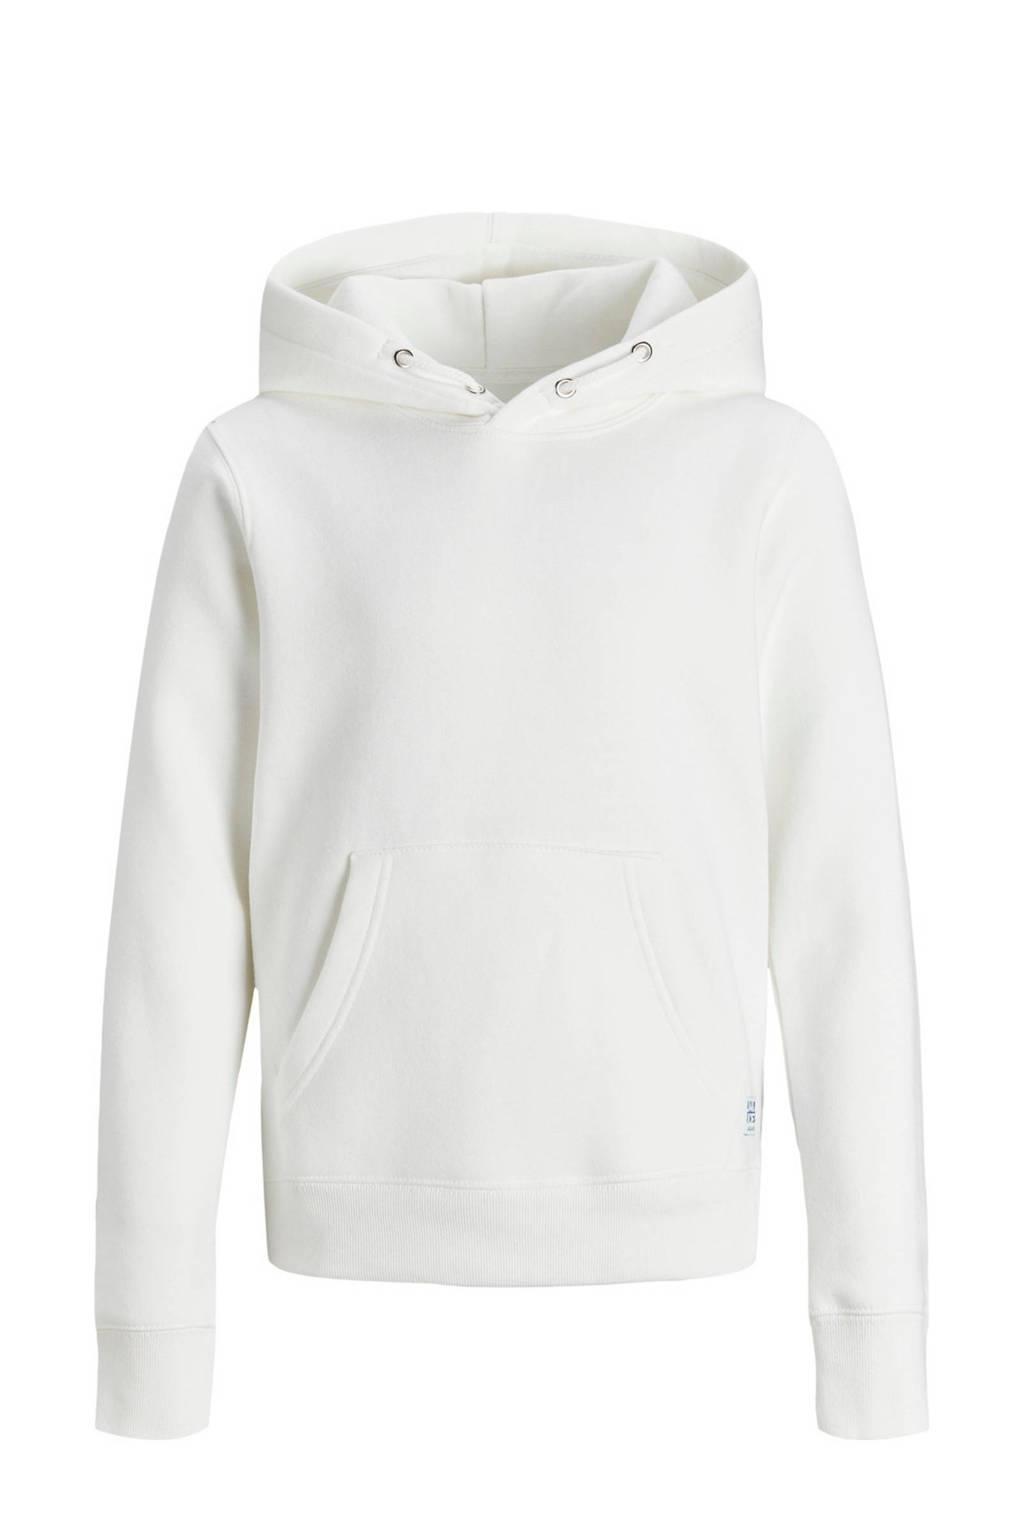 JACK & JONES JUNIOR hoodie Soft wit, Wit